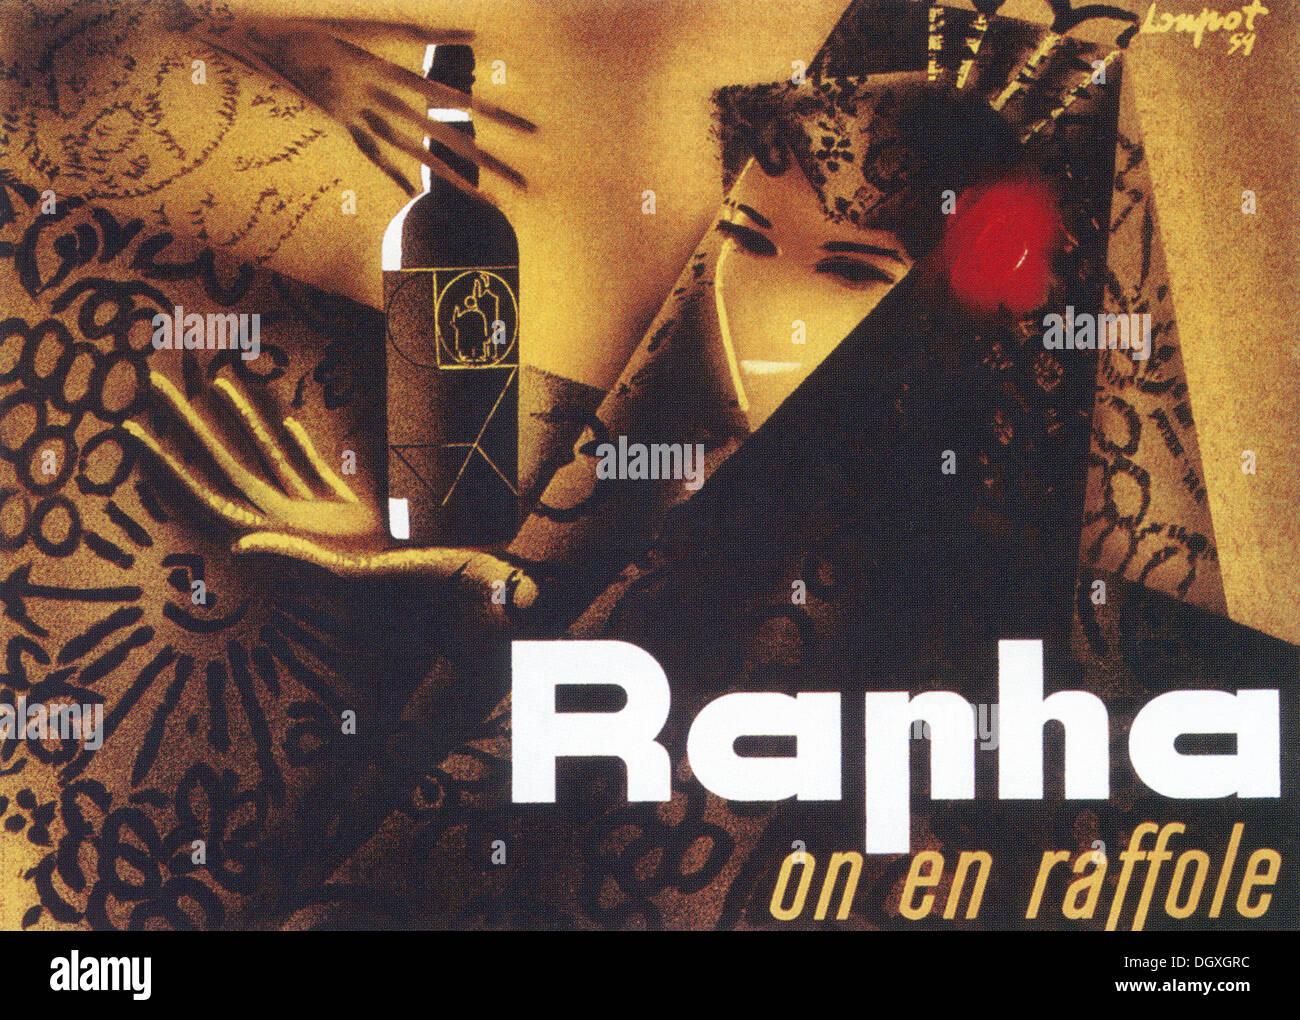 Rapha - Da Charles Loupot, poster vintage - solo uso editoriale. Immagini Stock